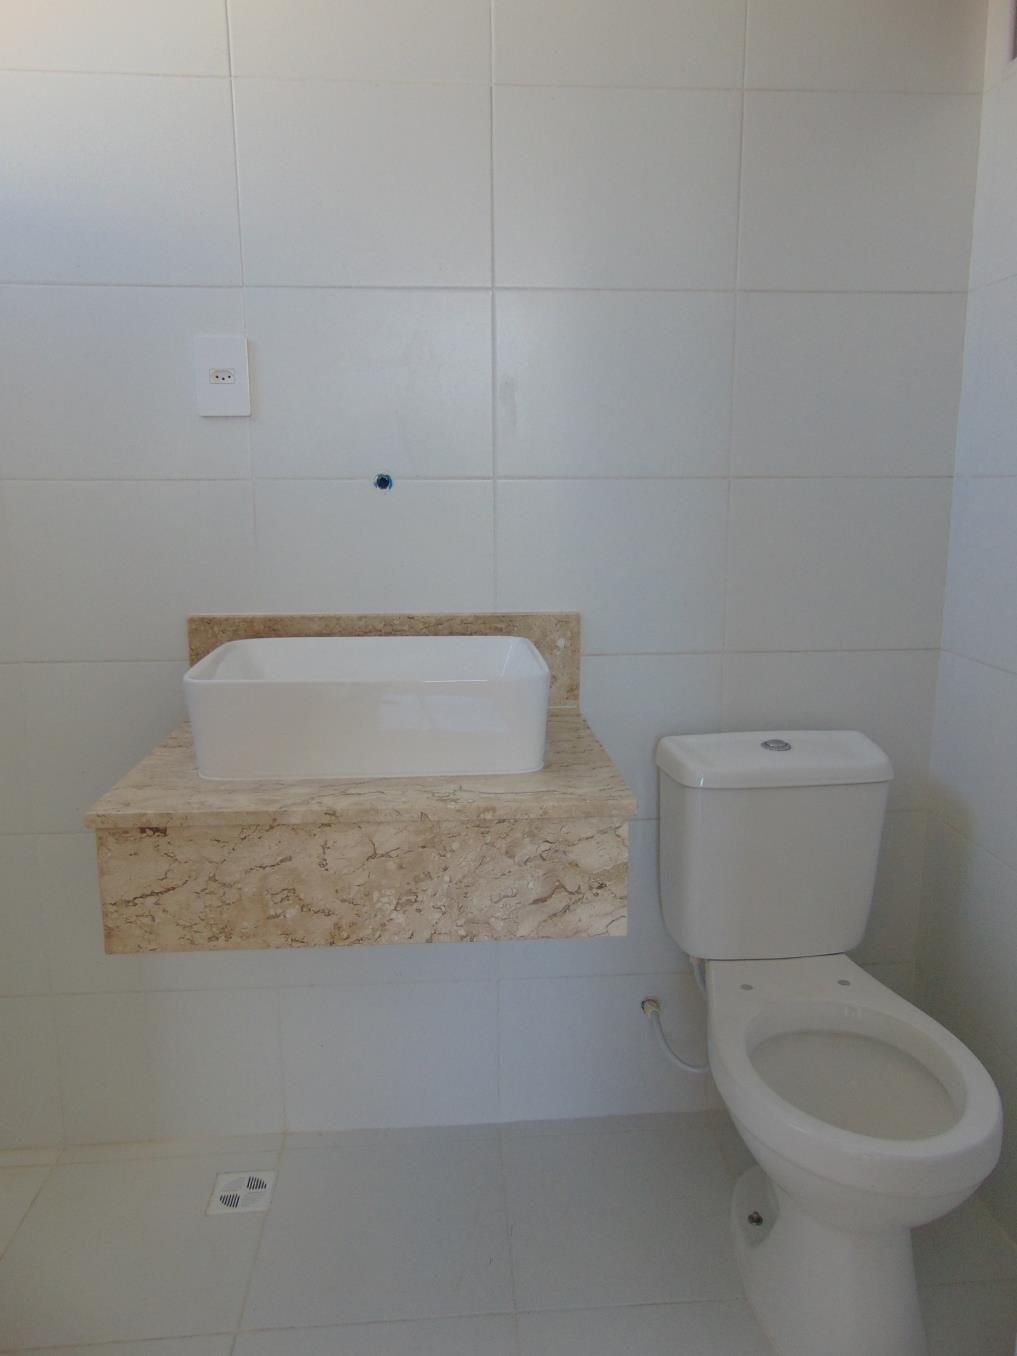 Apartamento – Foto do Banheiro da Suíte do Residencial Vista Bella